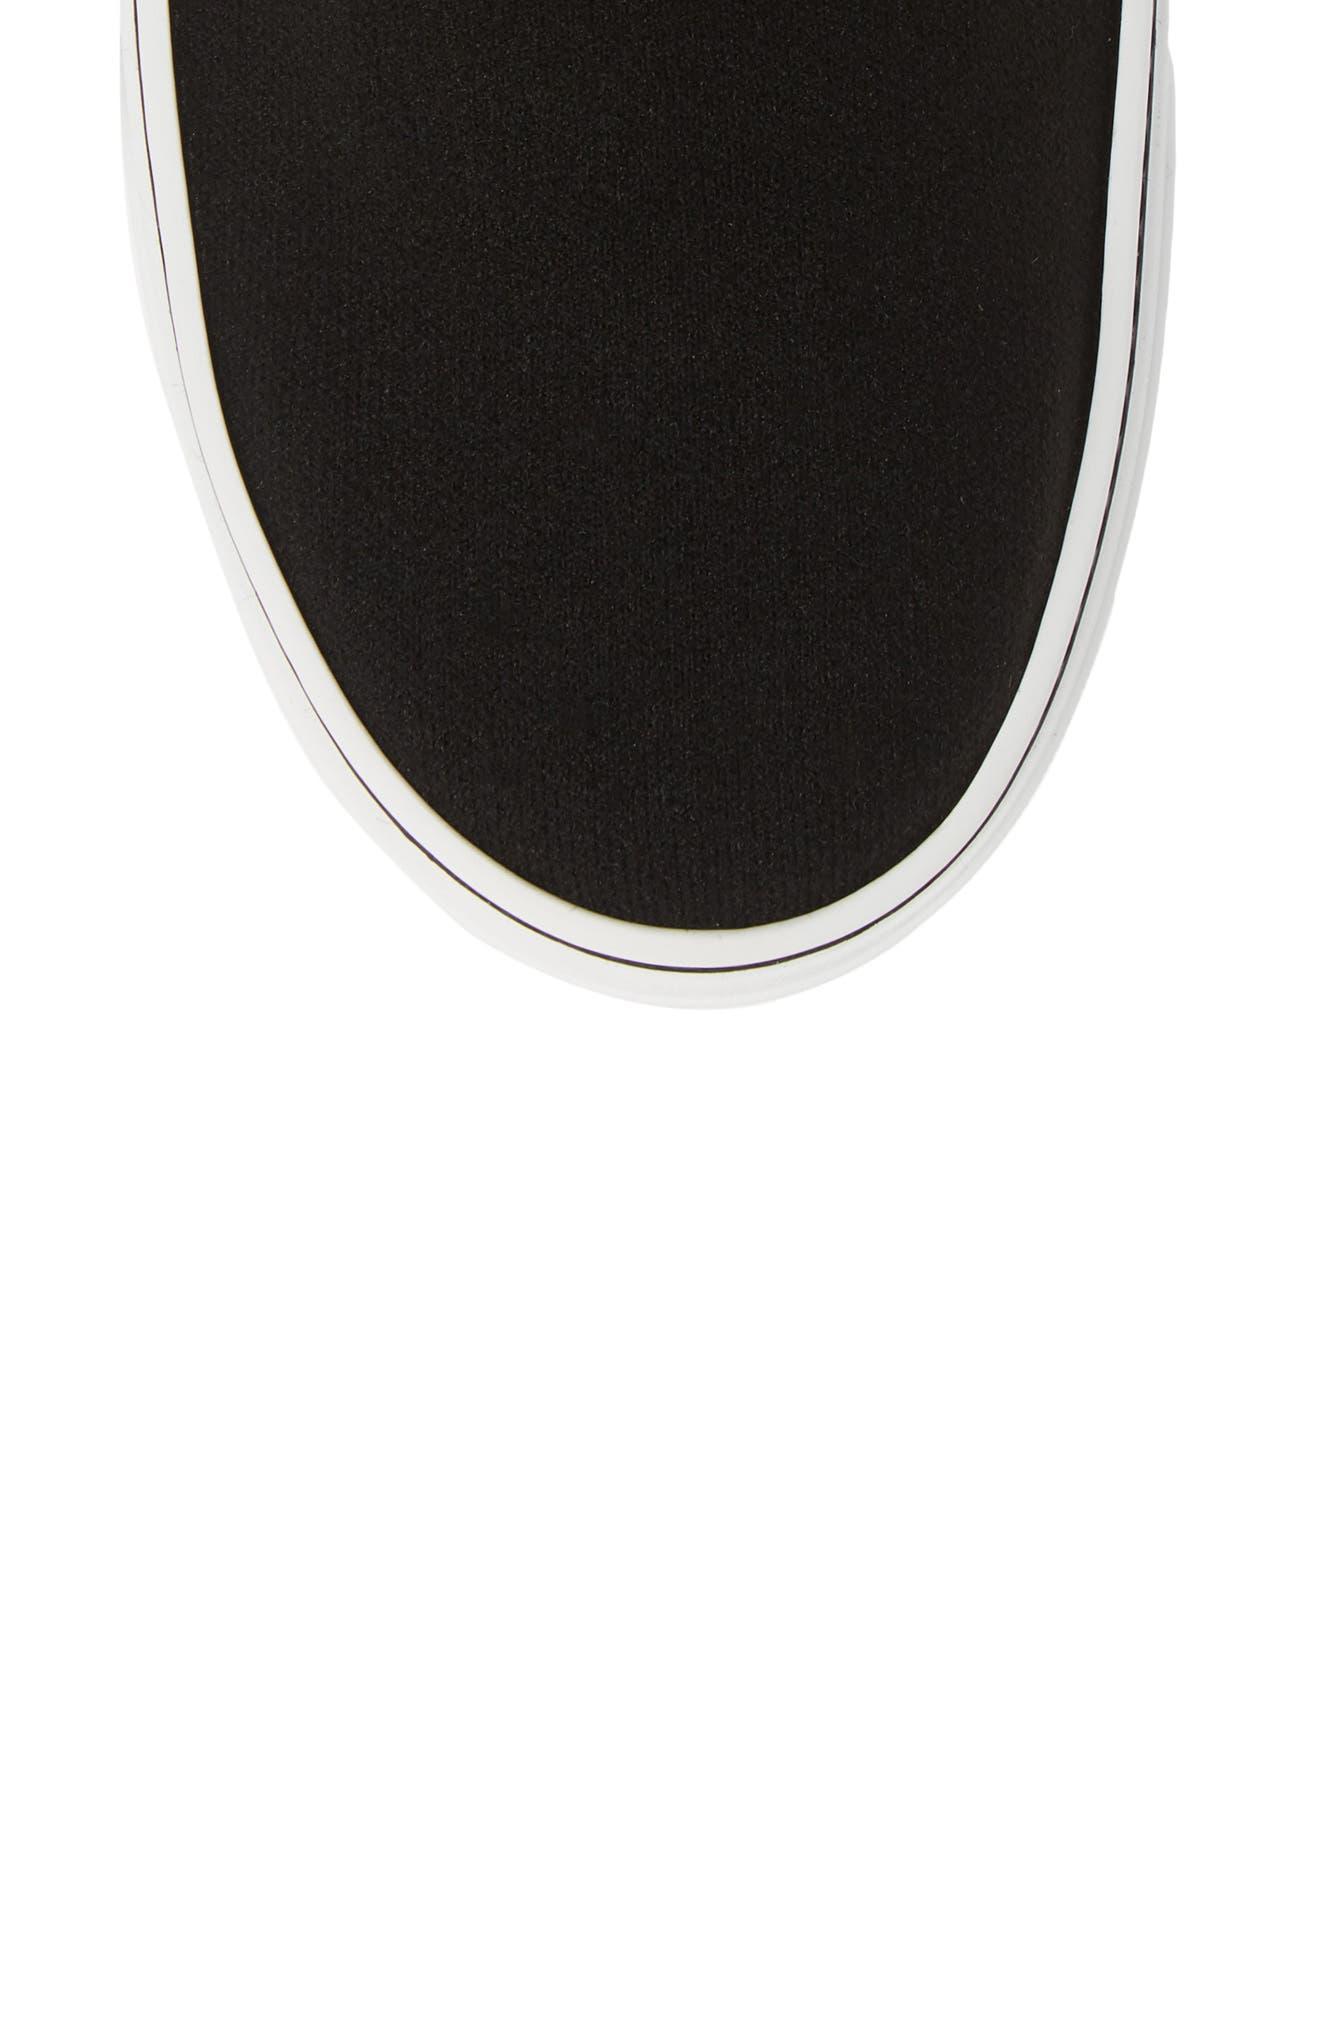 George V Sneaker,                             Alternate thumbnail 5, color,                             BLACK/ RED